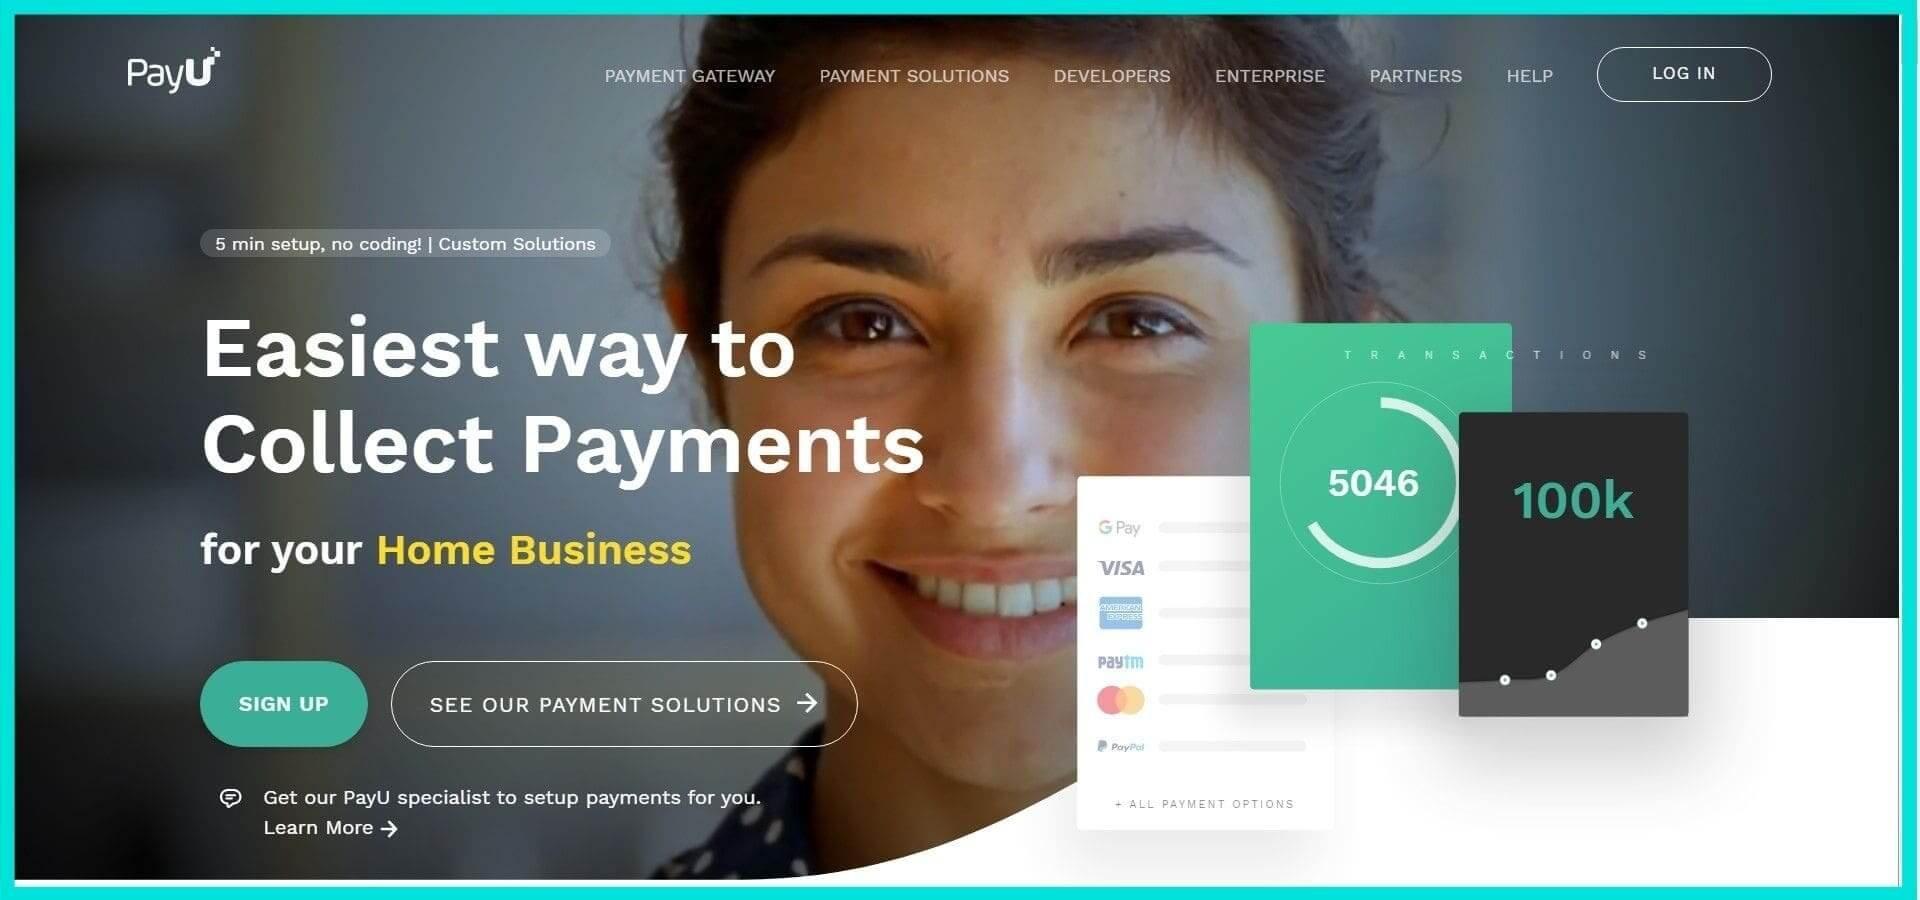 PayU Site Screenshot